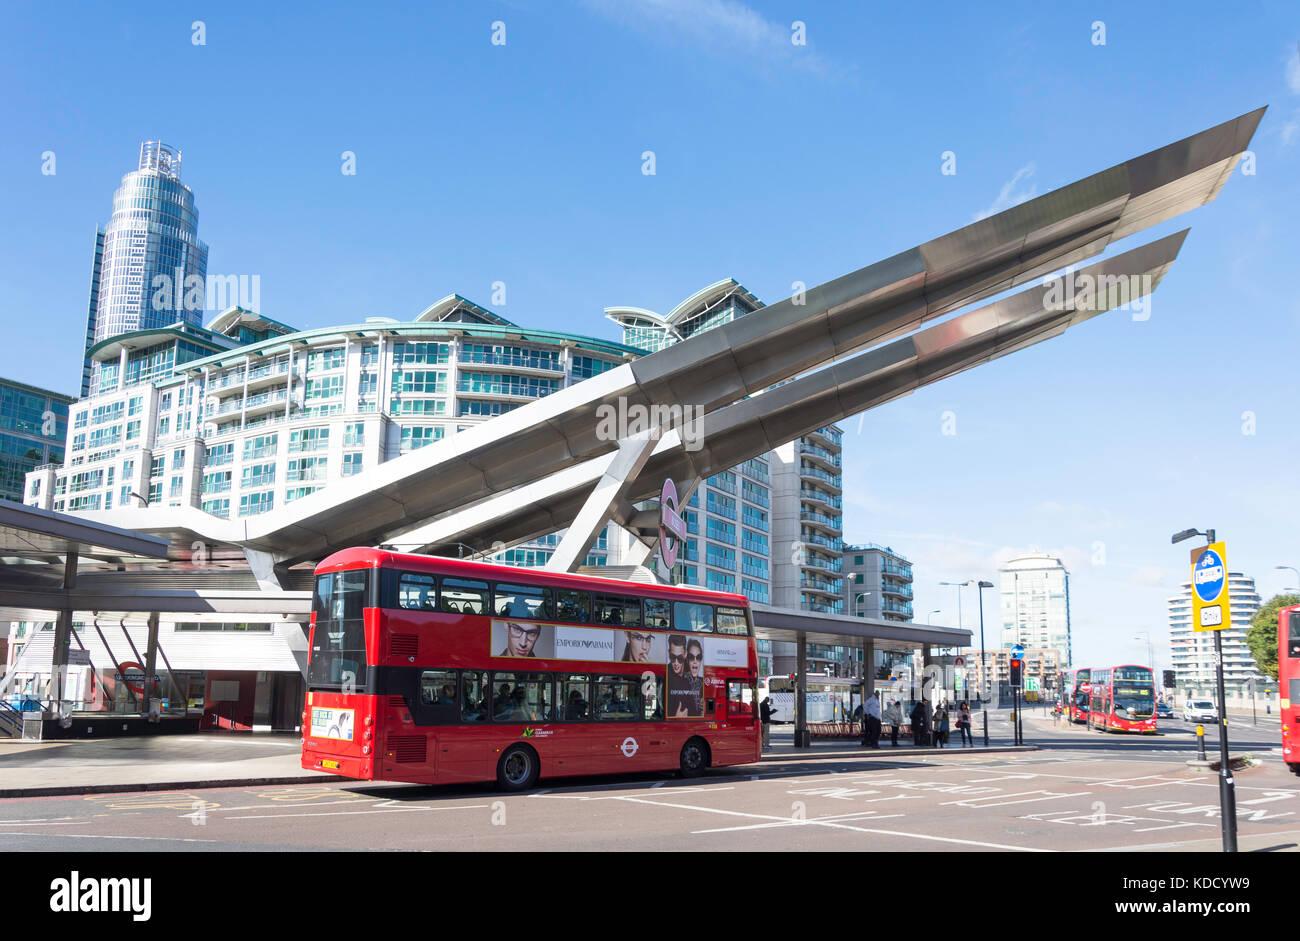 The Vauxhall Cross transport interchange, Vauxhall, London Borough of Lambeth, London, Greater London, England, - Stock Image